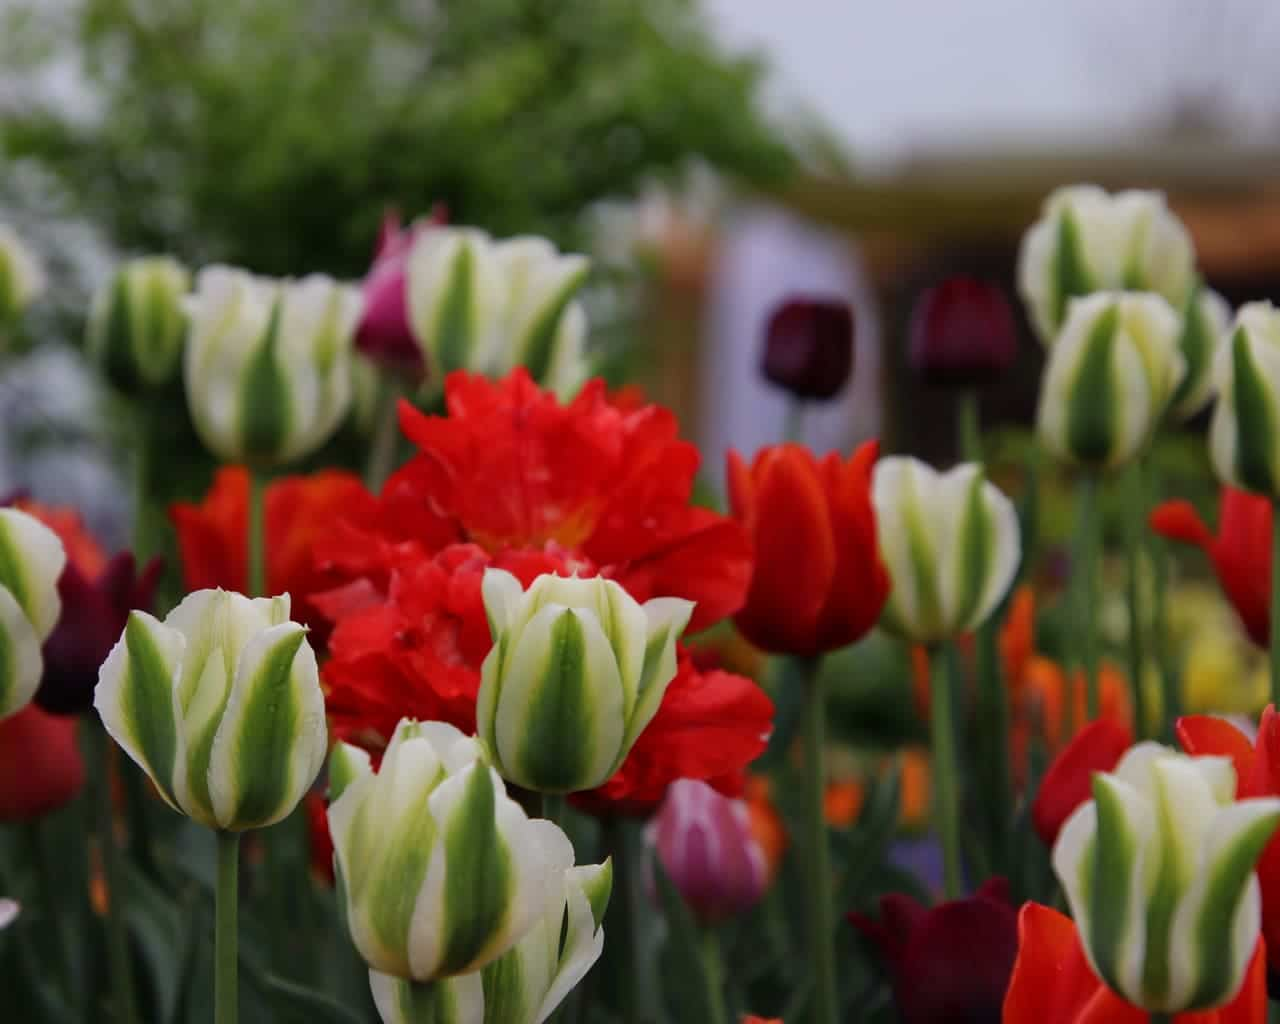 Tulpenpflanzung mit Viridiflora Tulpen auf der Landesgartenschau Würzburg 2018, Planung Petra Pelz